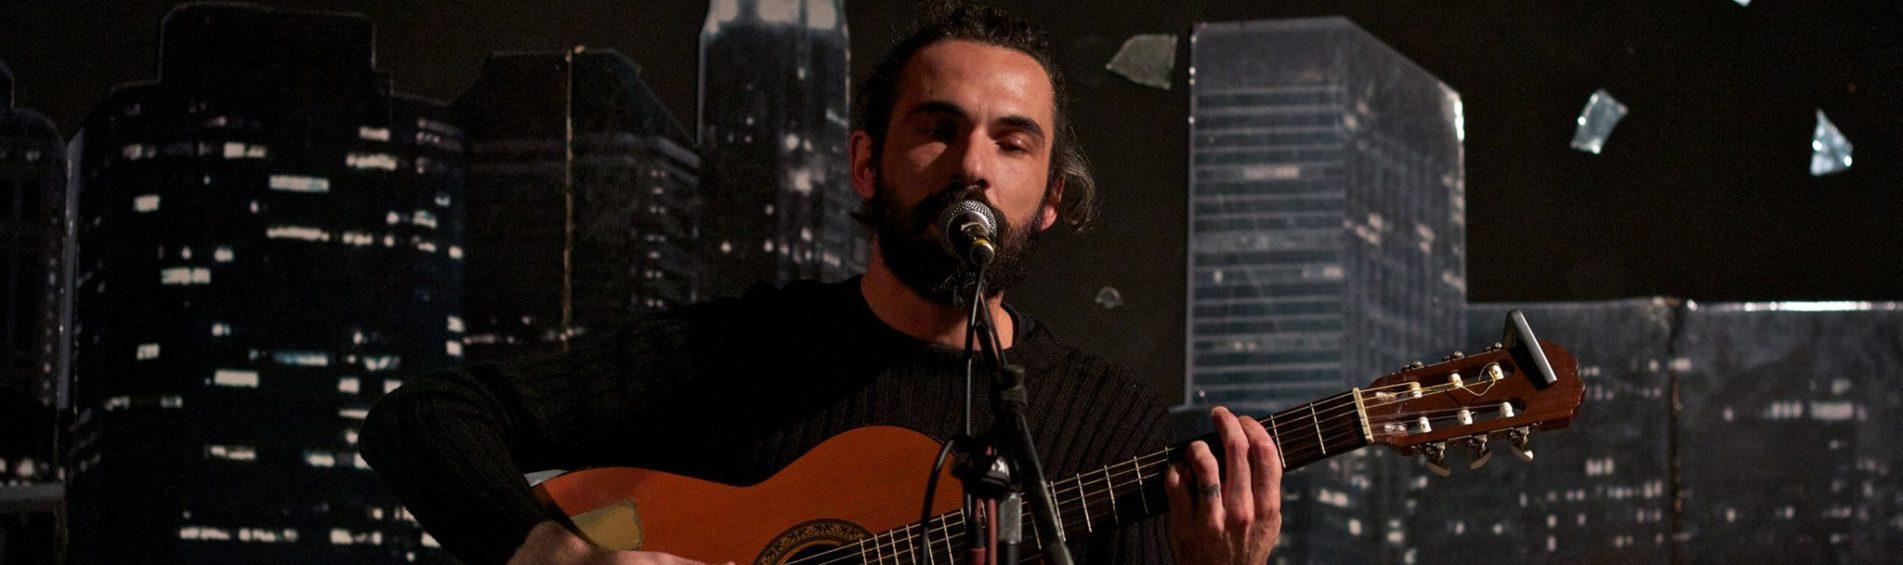 Joseph Foll live al Club 33 Giri: in apertura Ivo Mancino